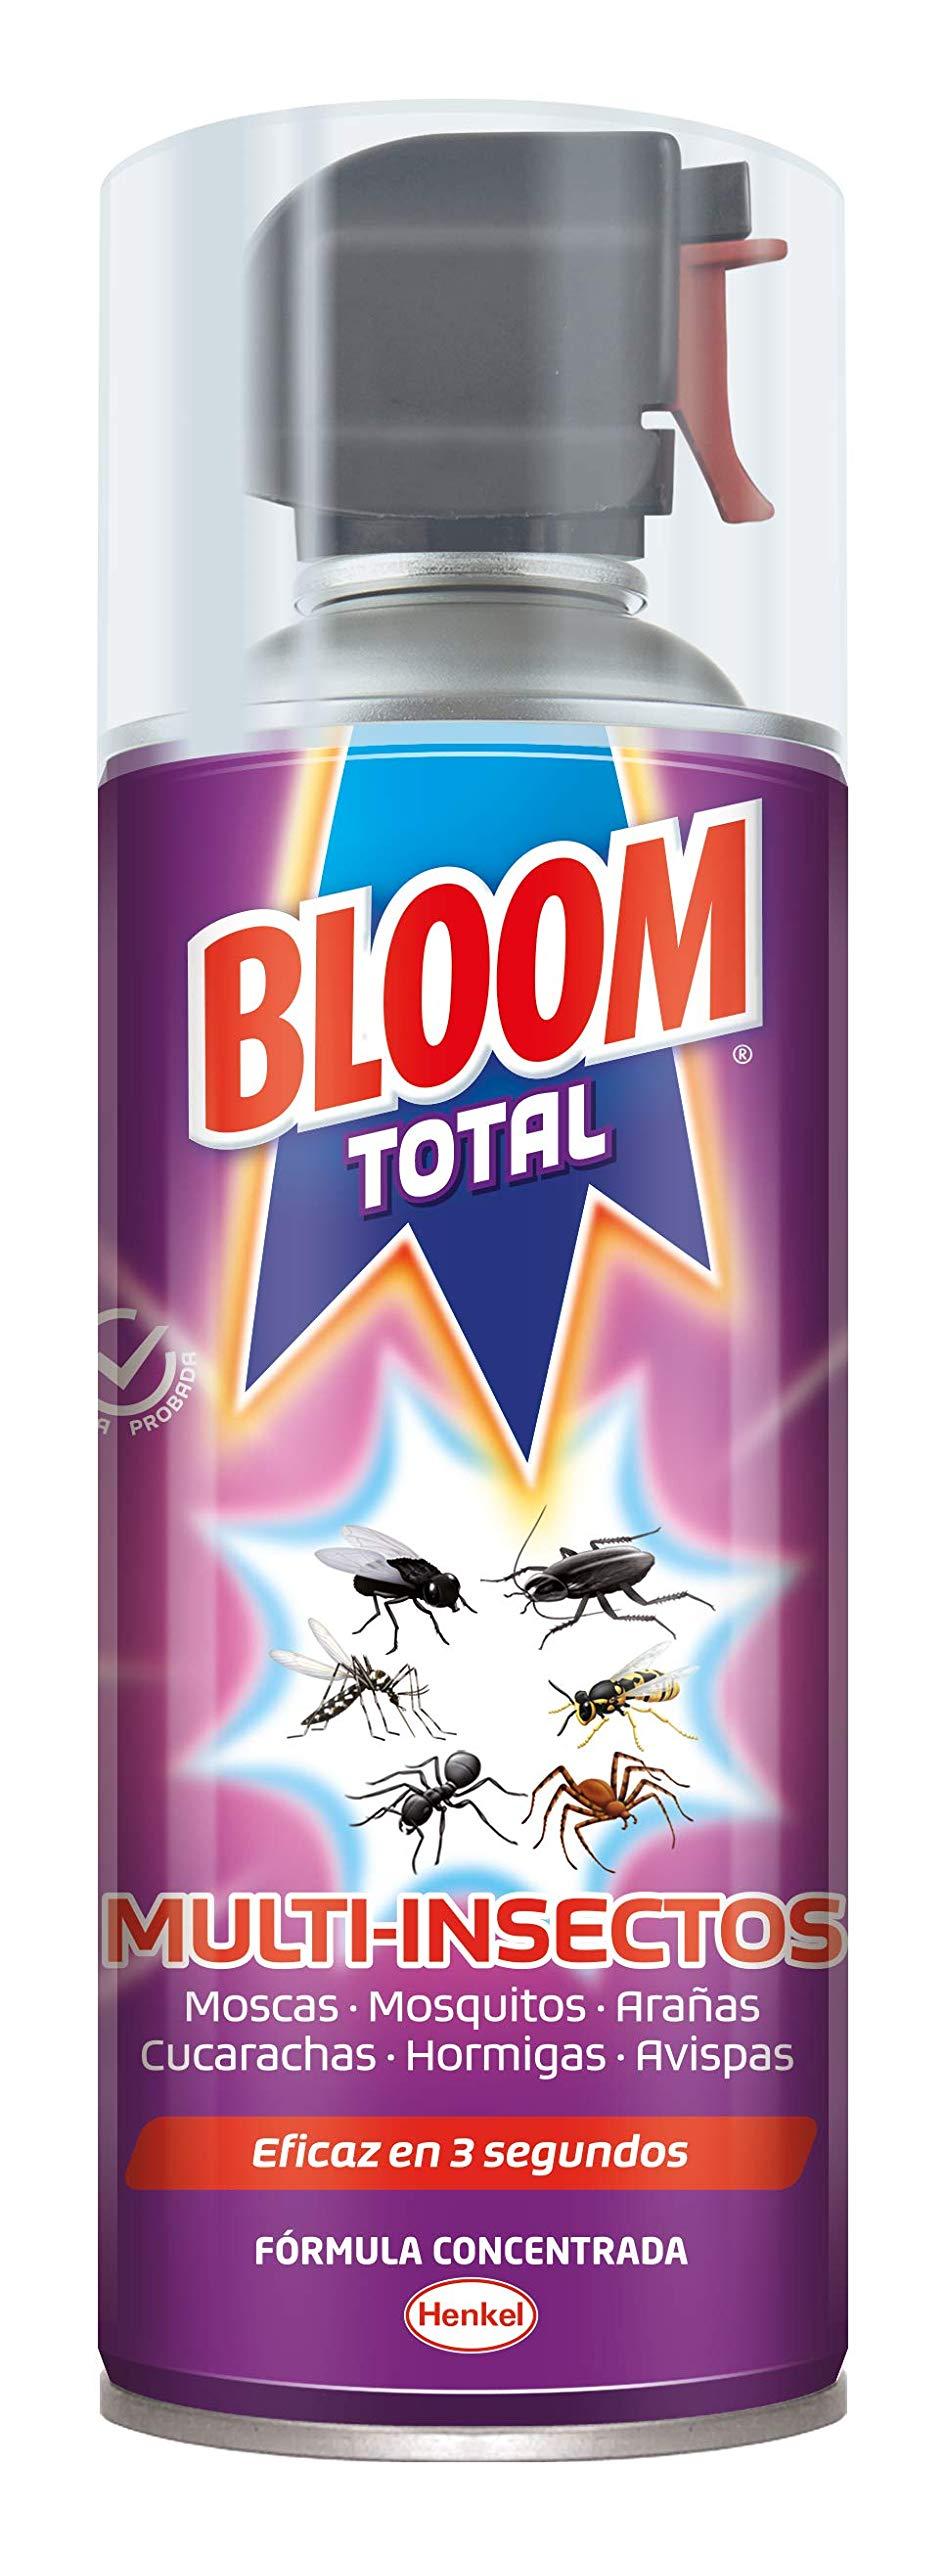 Bloom Total Multi-Insectos Aerosol - 400ml